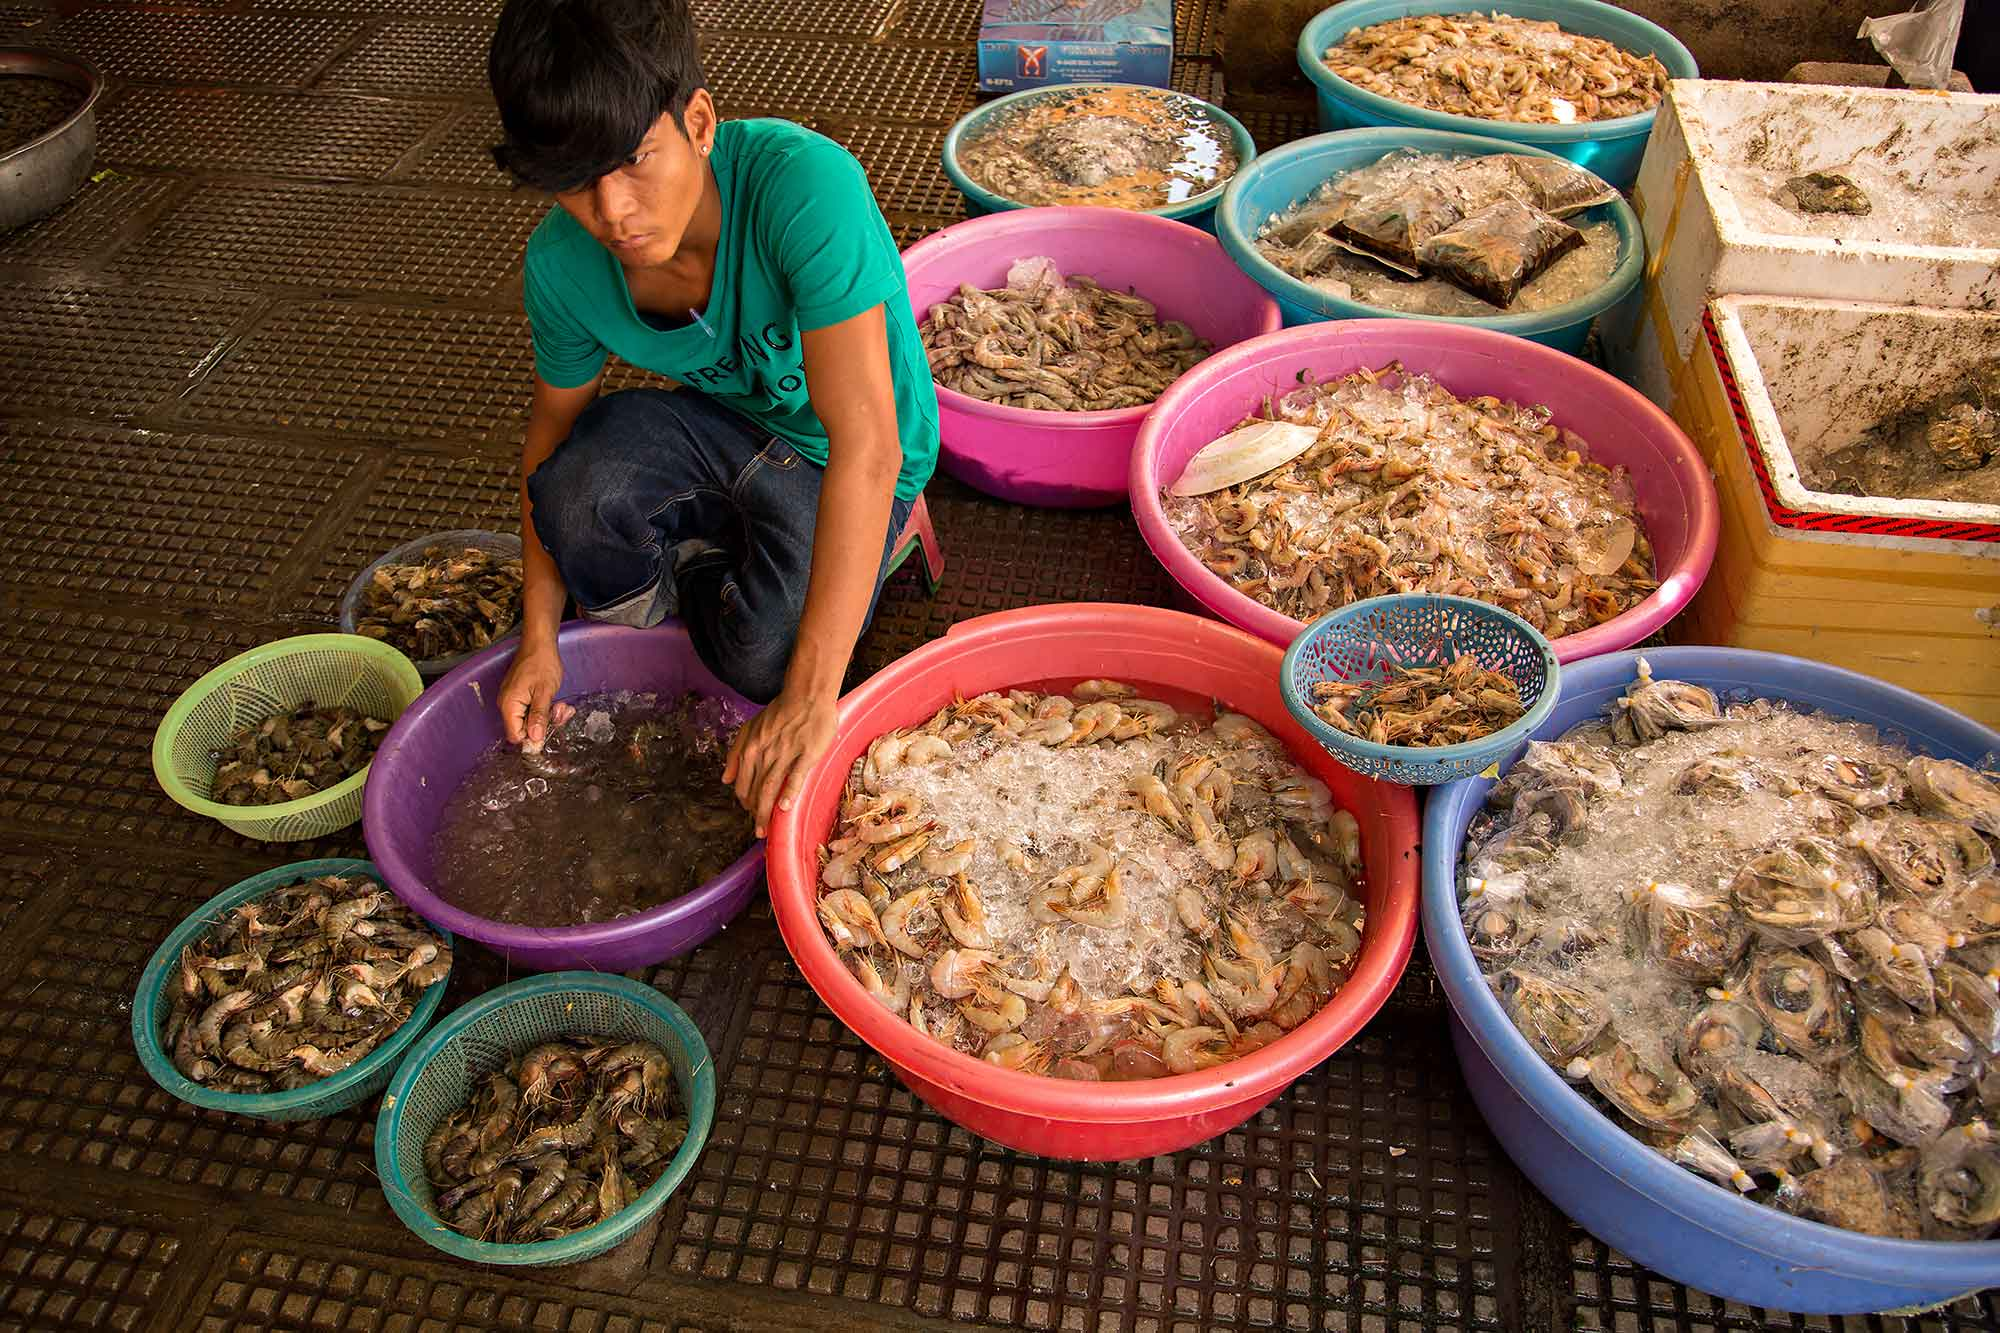 Selling fresh prawn at Phsar Thmei market in Phnom Penh, Cambodia. © Ulli Maier & Nisa Maier